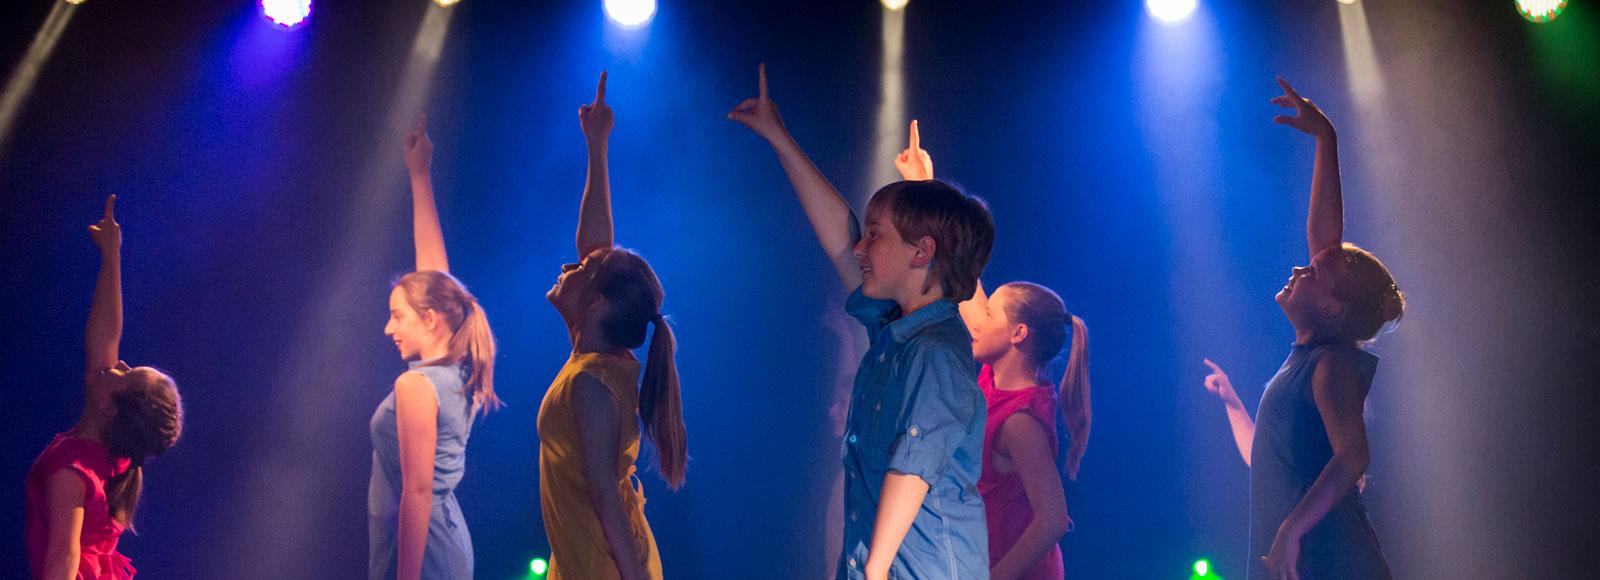 Koreo Piko dansoptreden